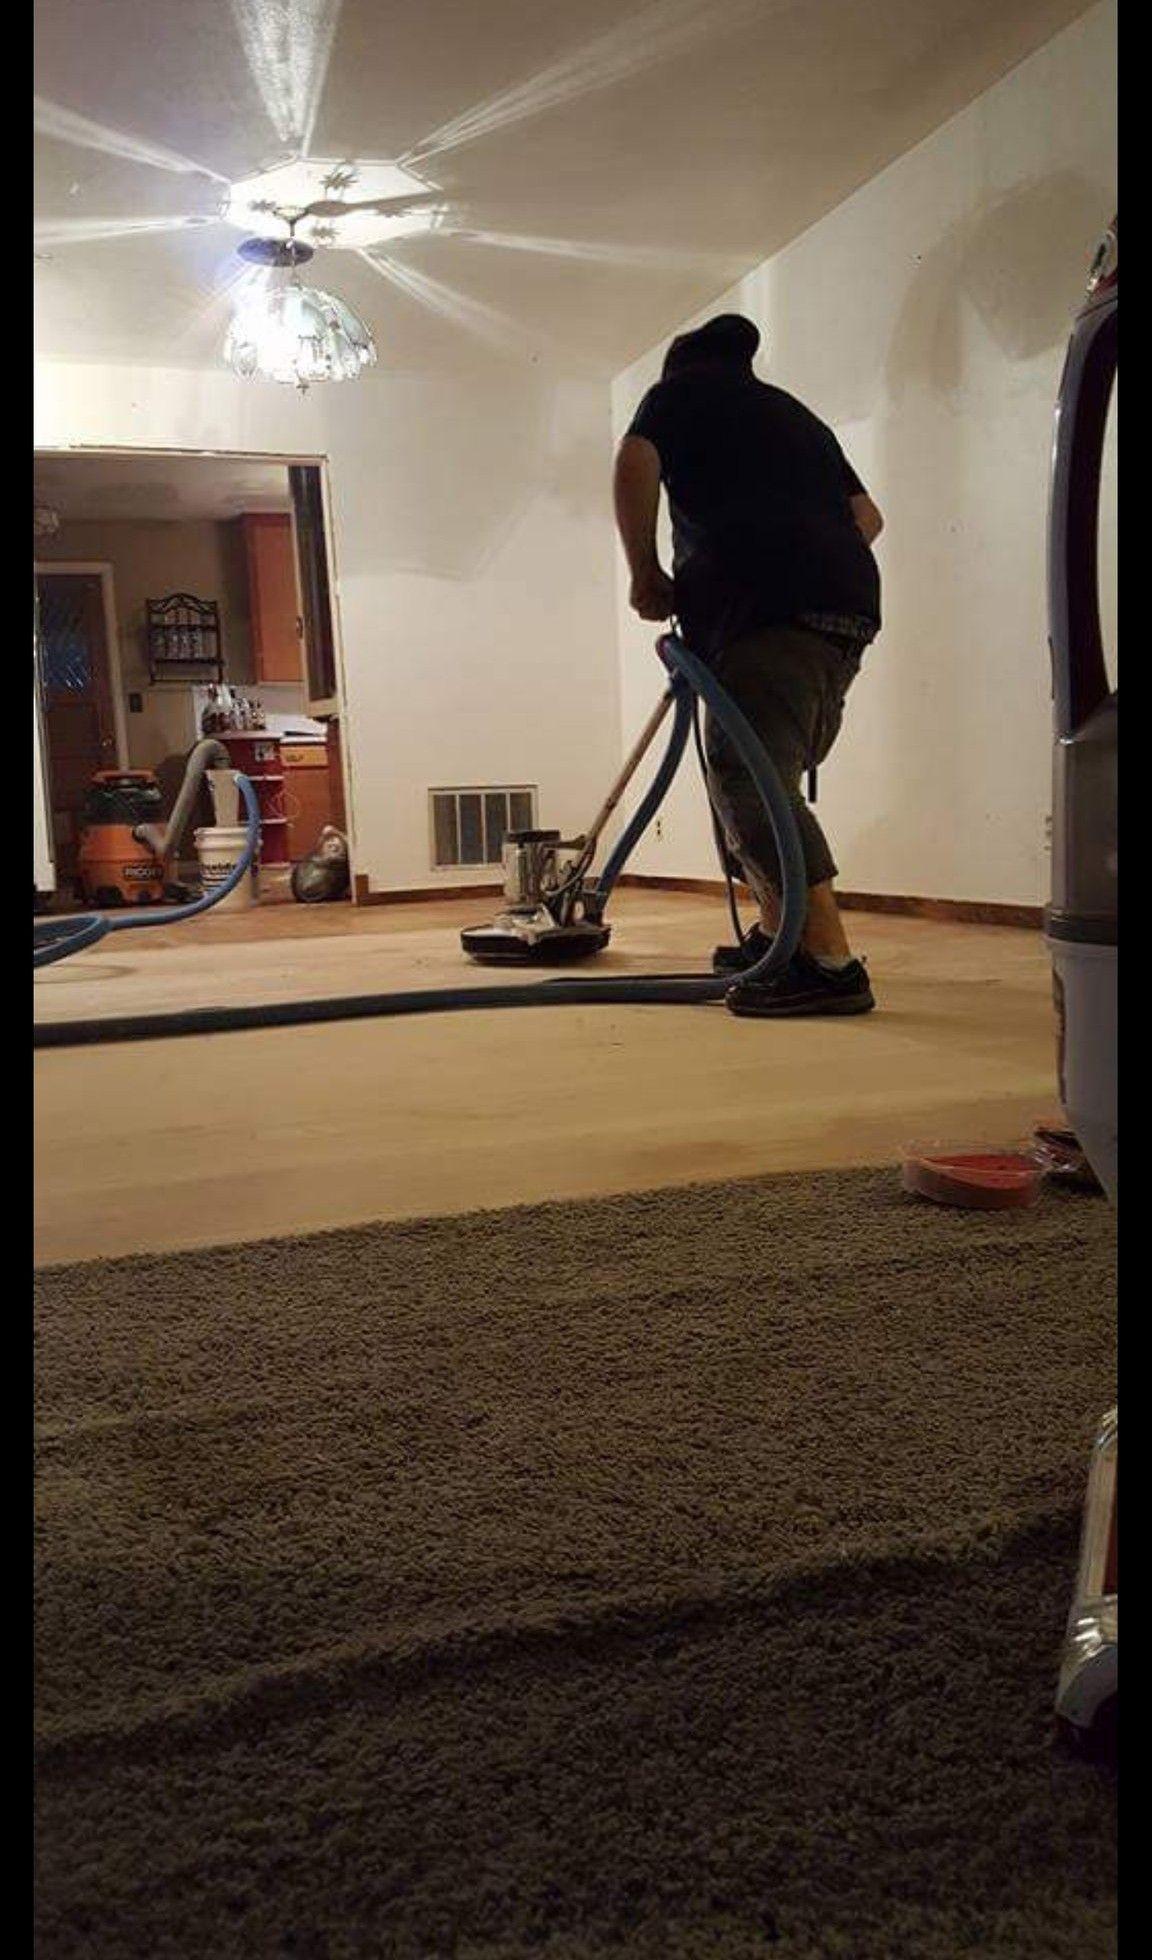 Sanding, Buffing, Refinish, Staining We Can Make Your Hardwood Floors